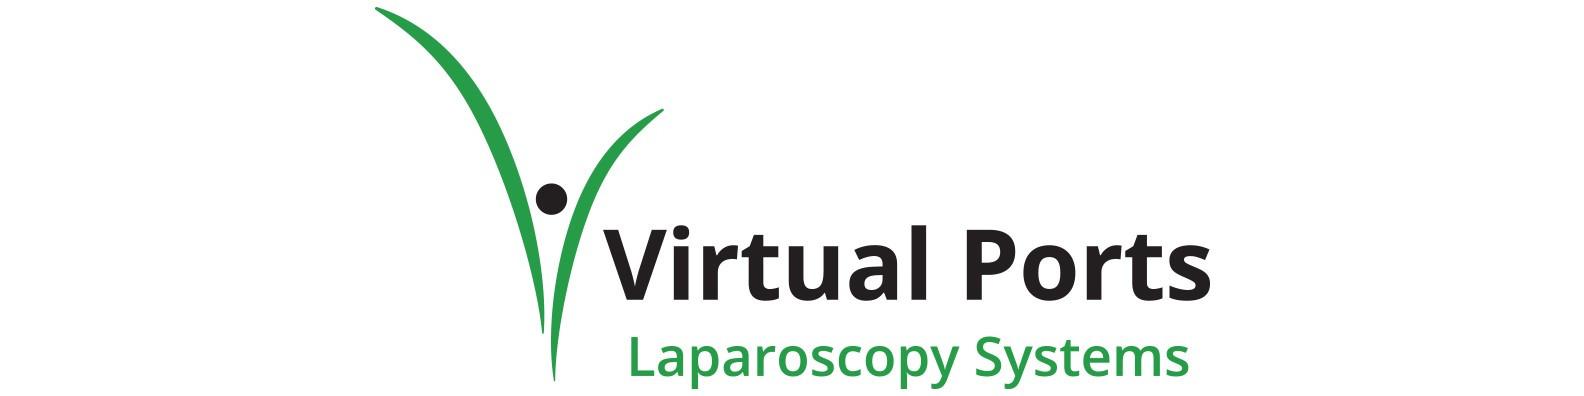 Virtual ports logo 1584X396.jpg